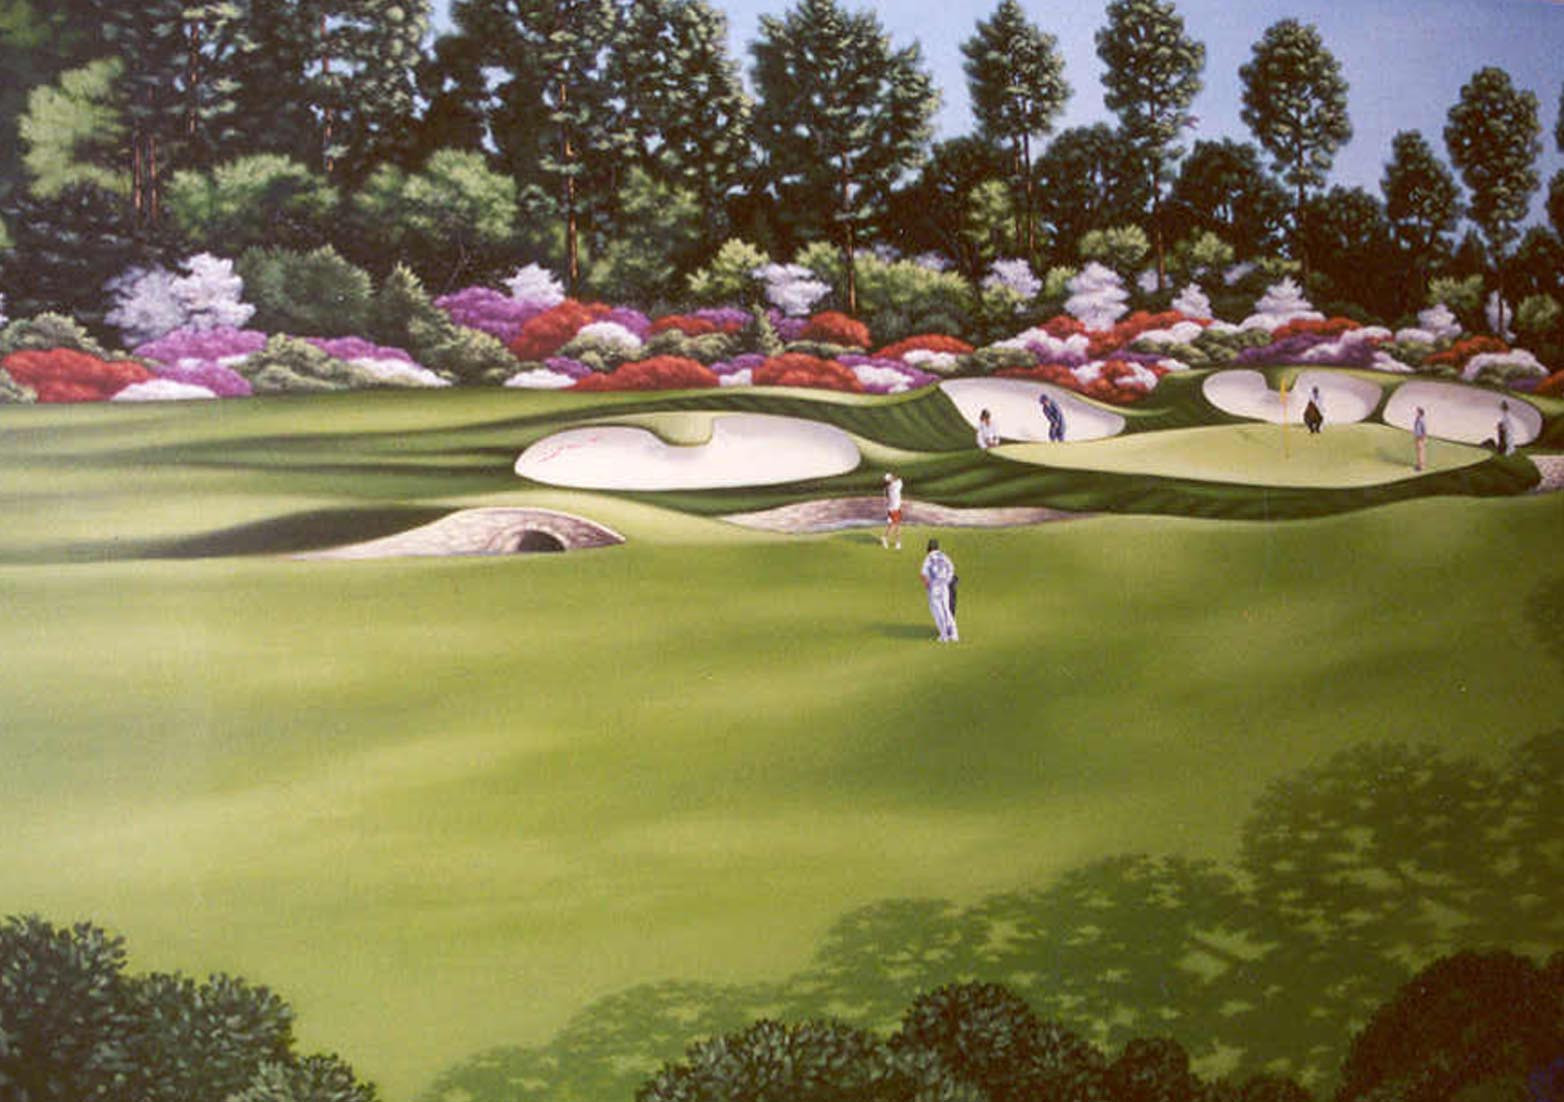 golfcoursecropped.jpg